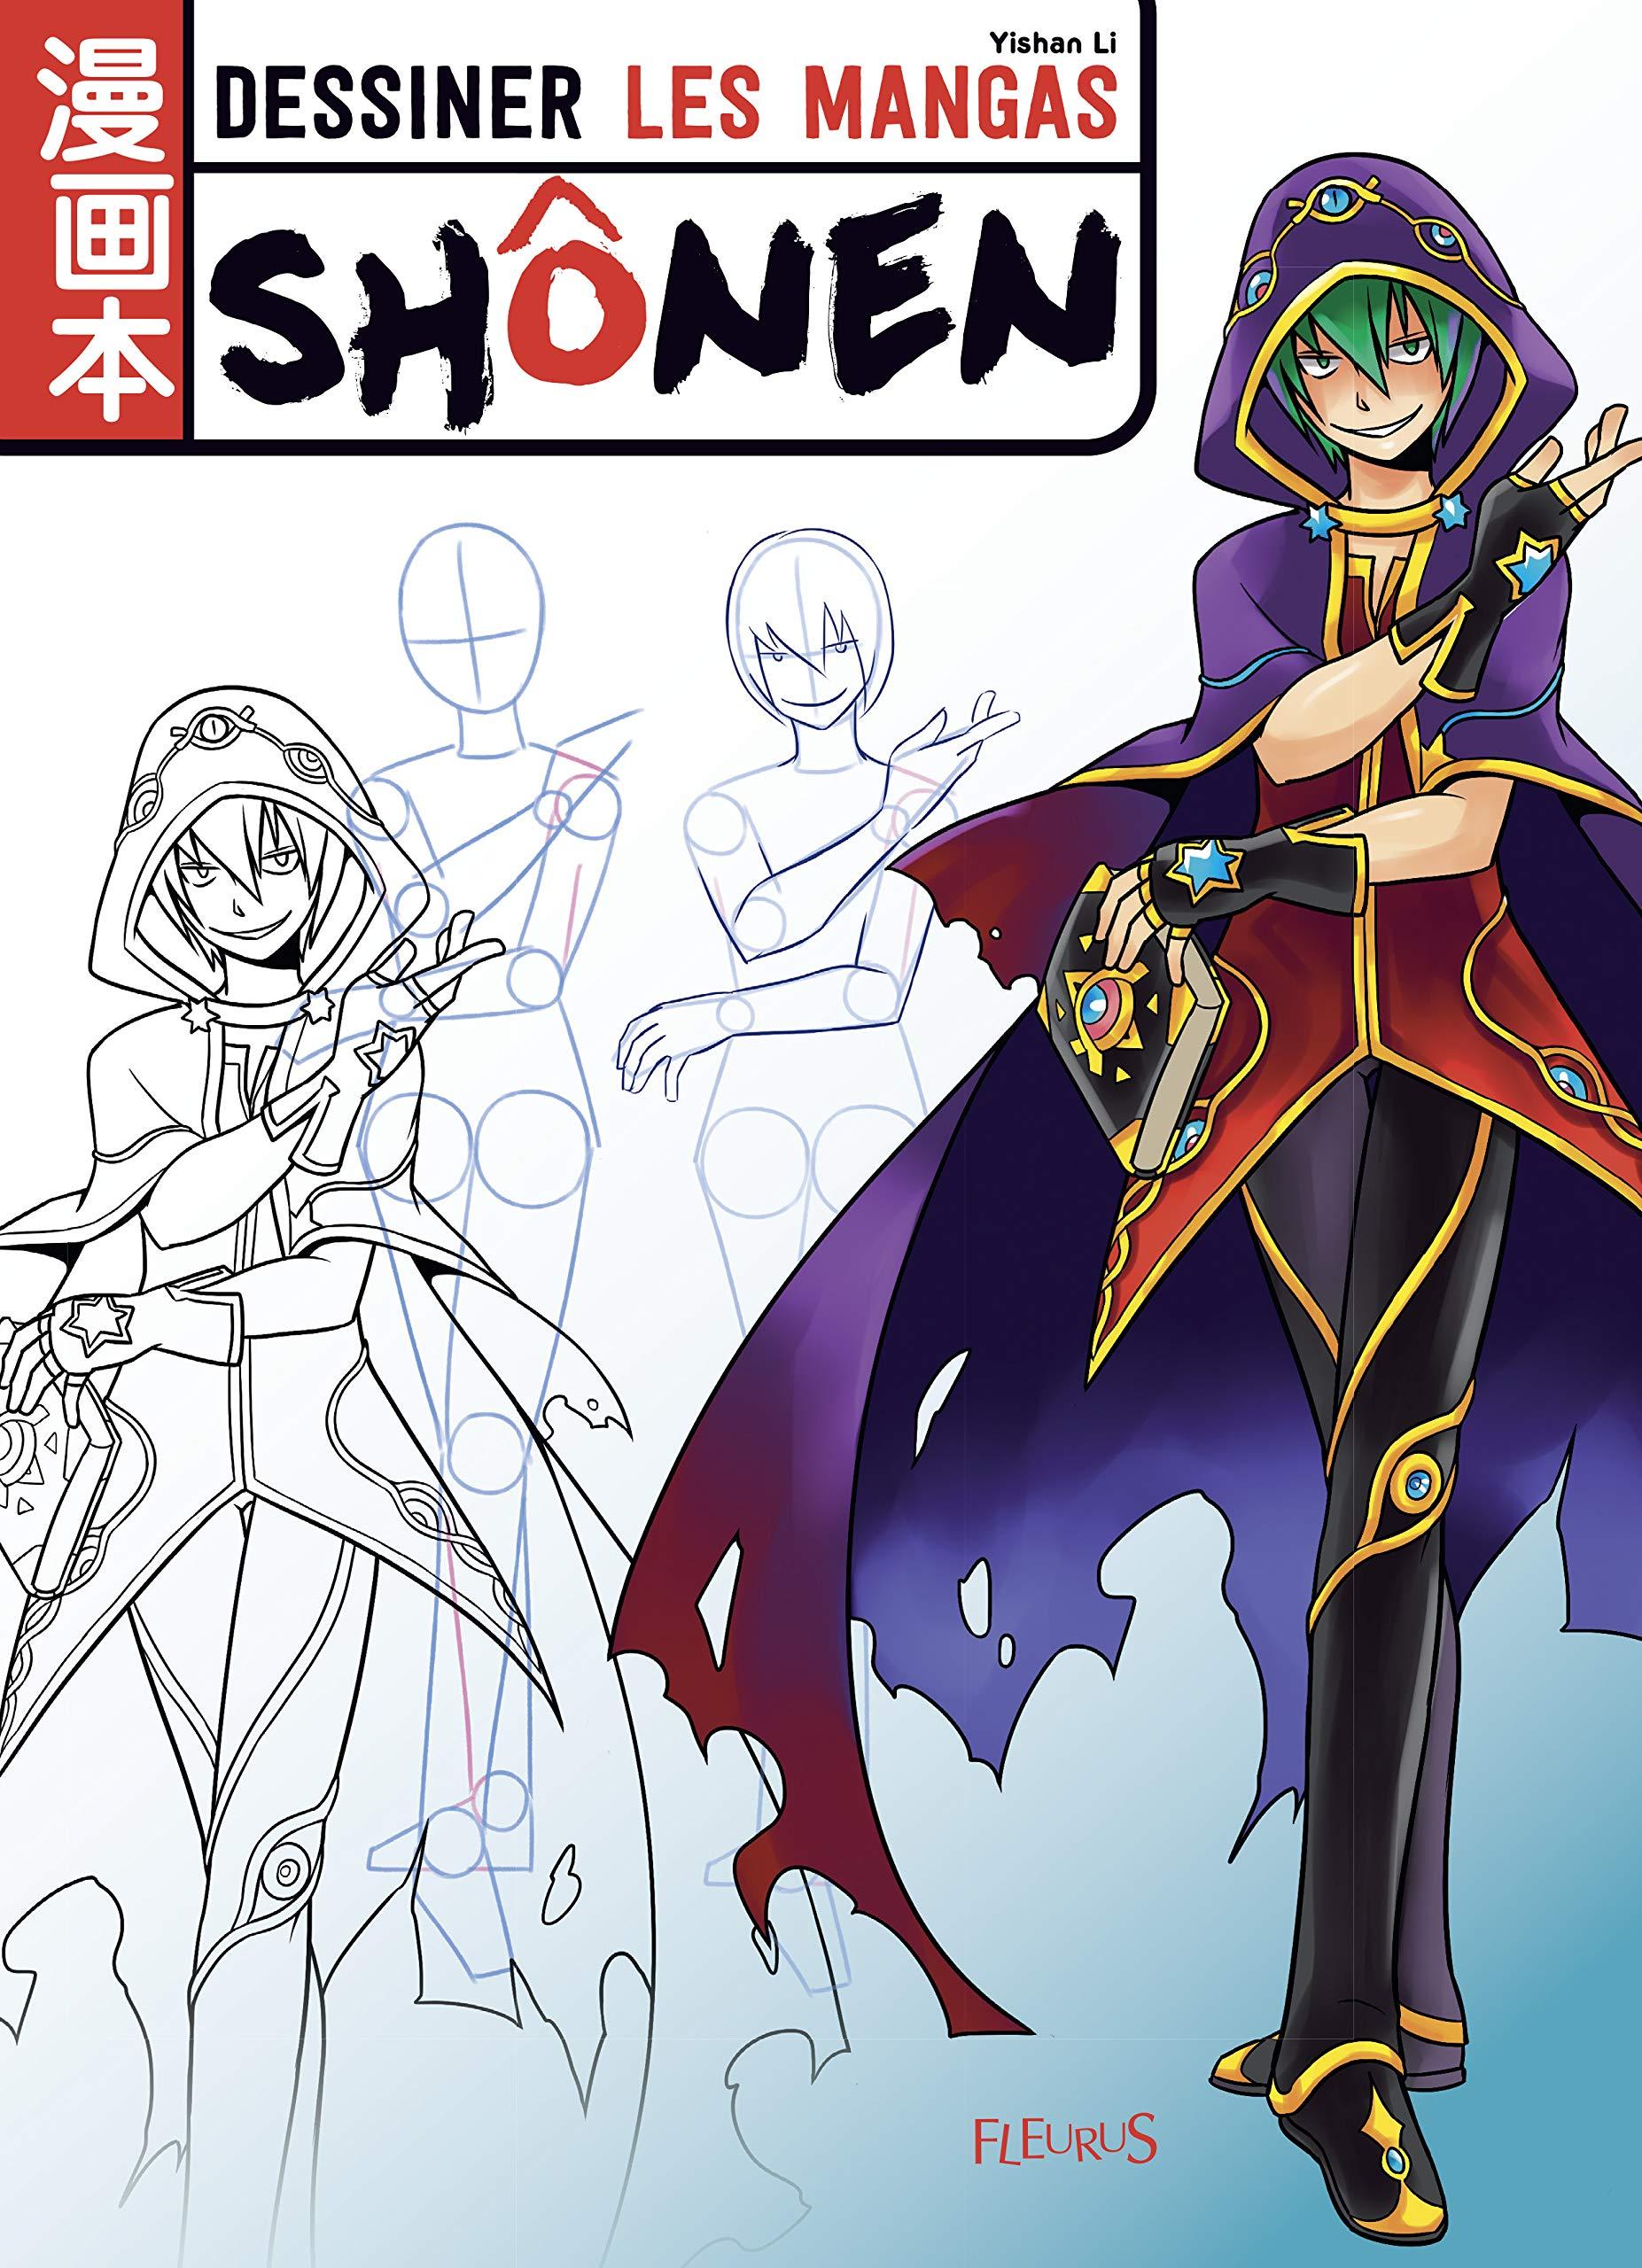 Amazon Fr Dessiner Les Mangas Shonen Yishan Li Livres